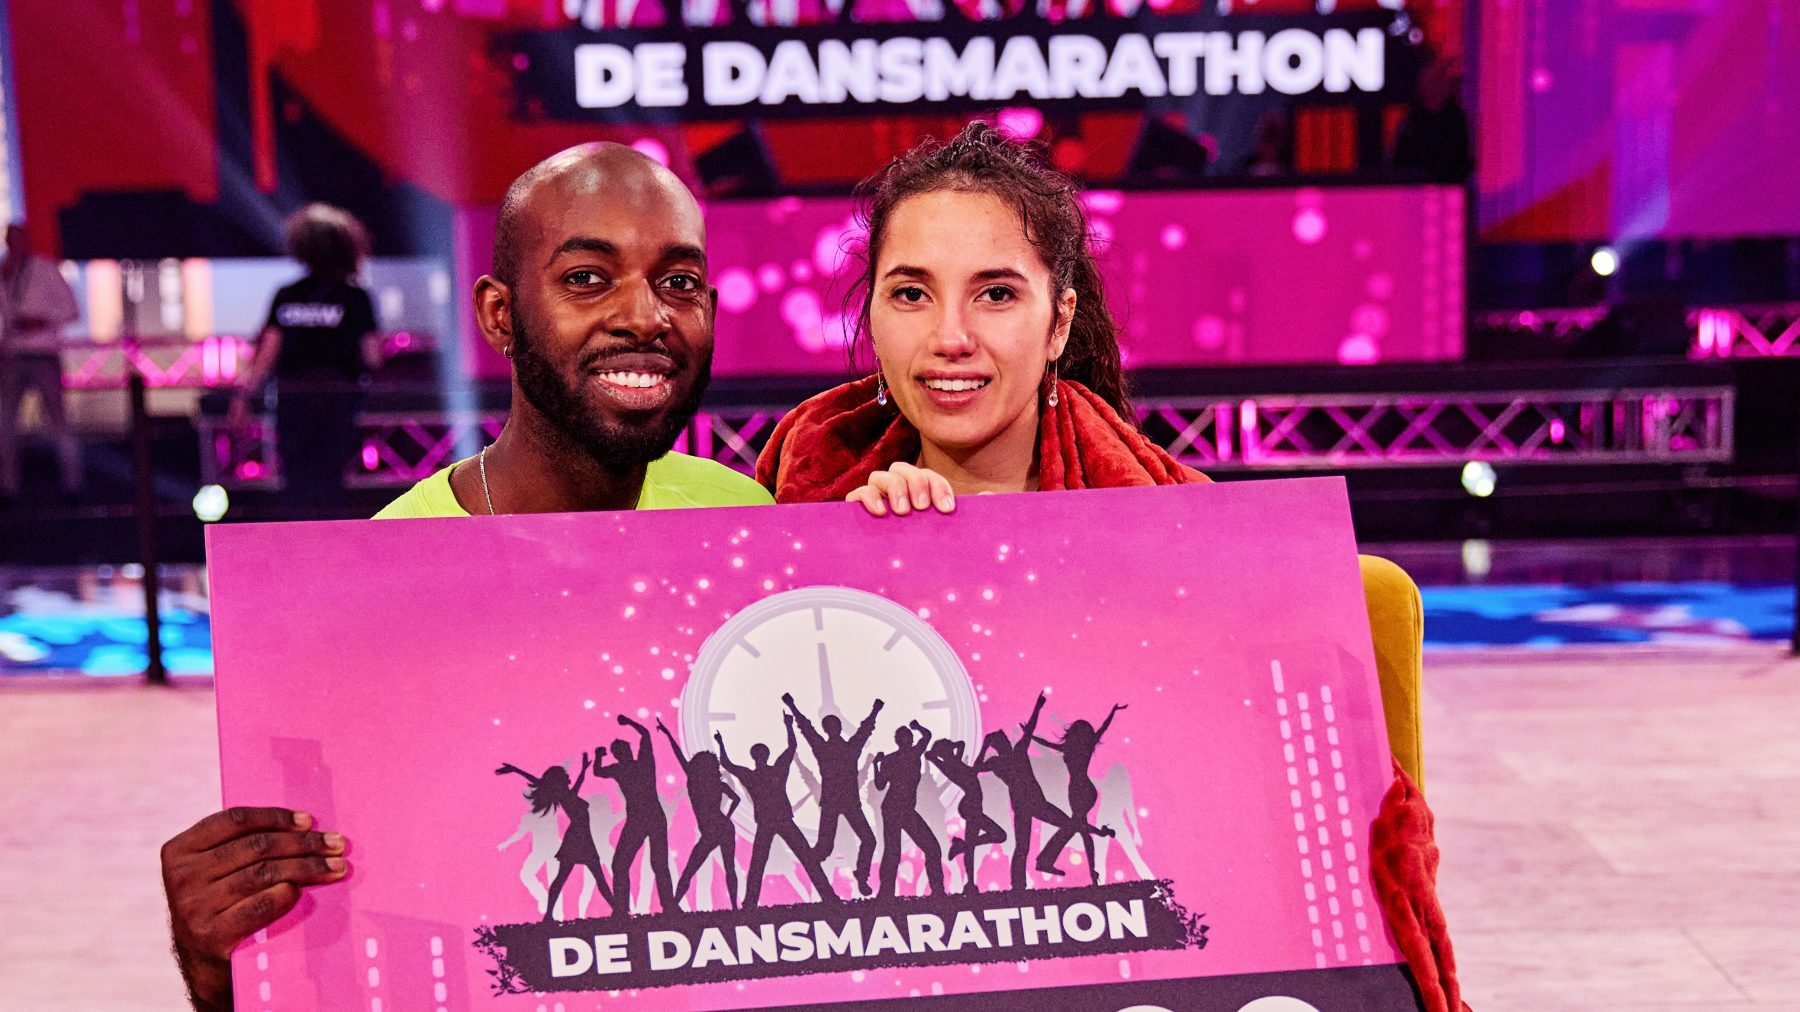 Dansmarathon winnaars